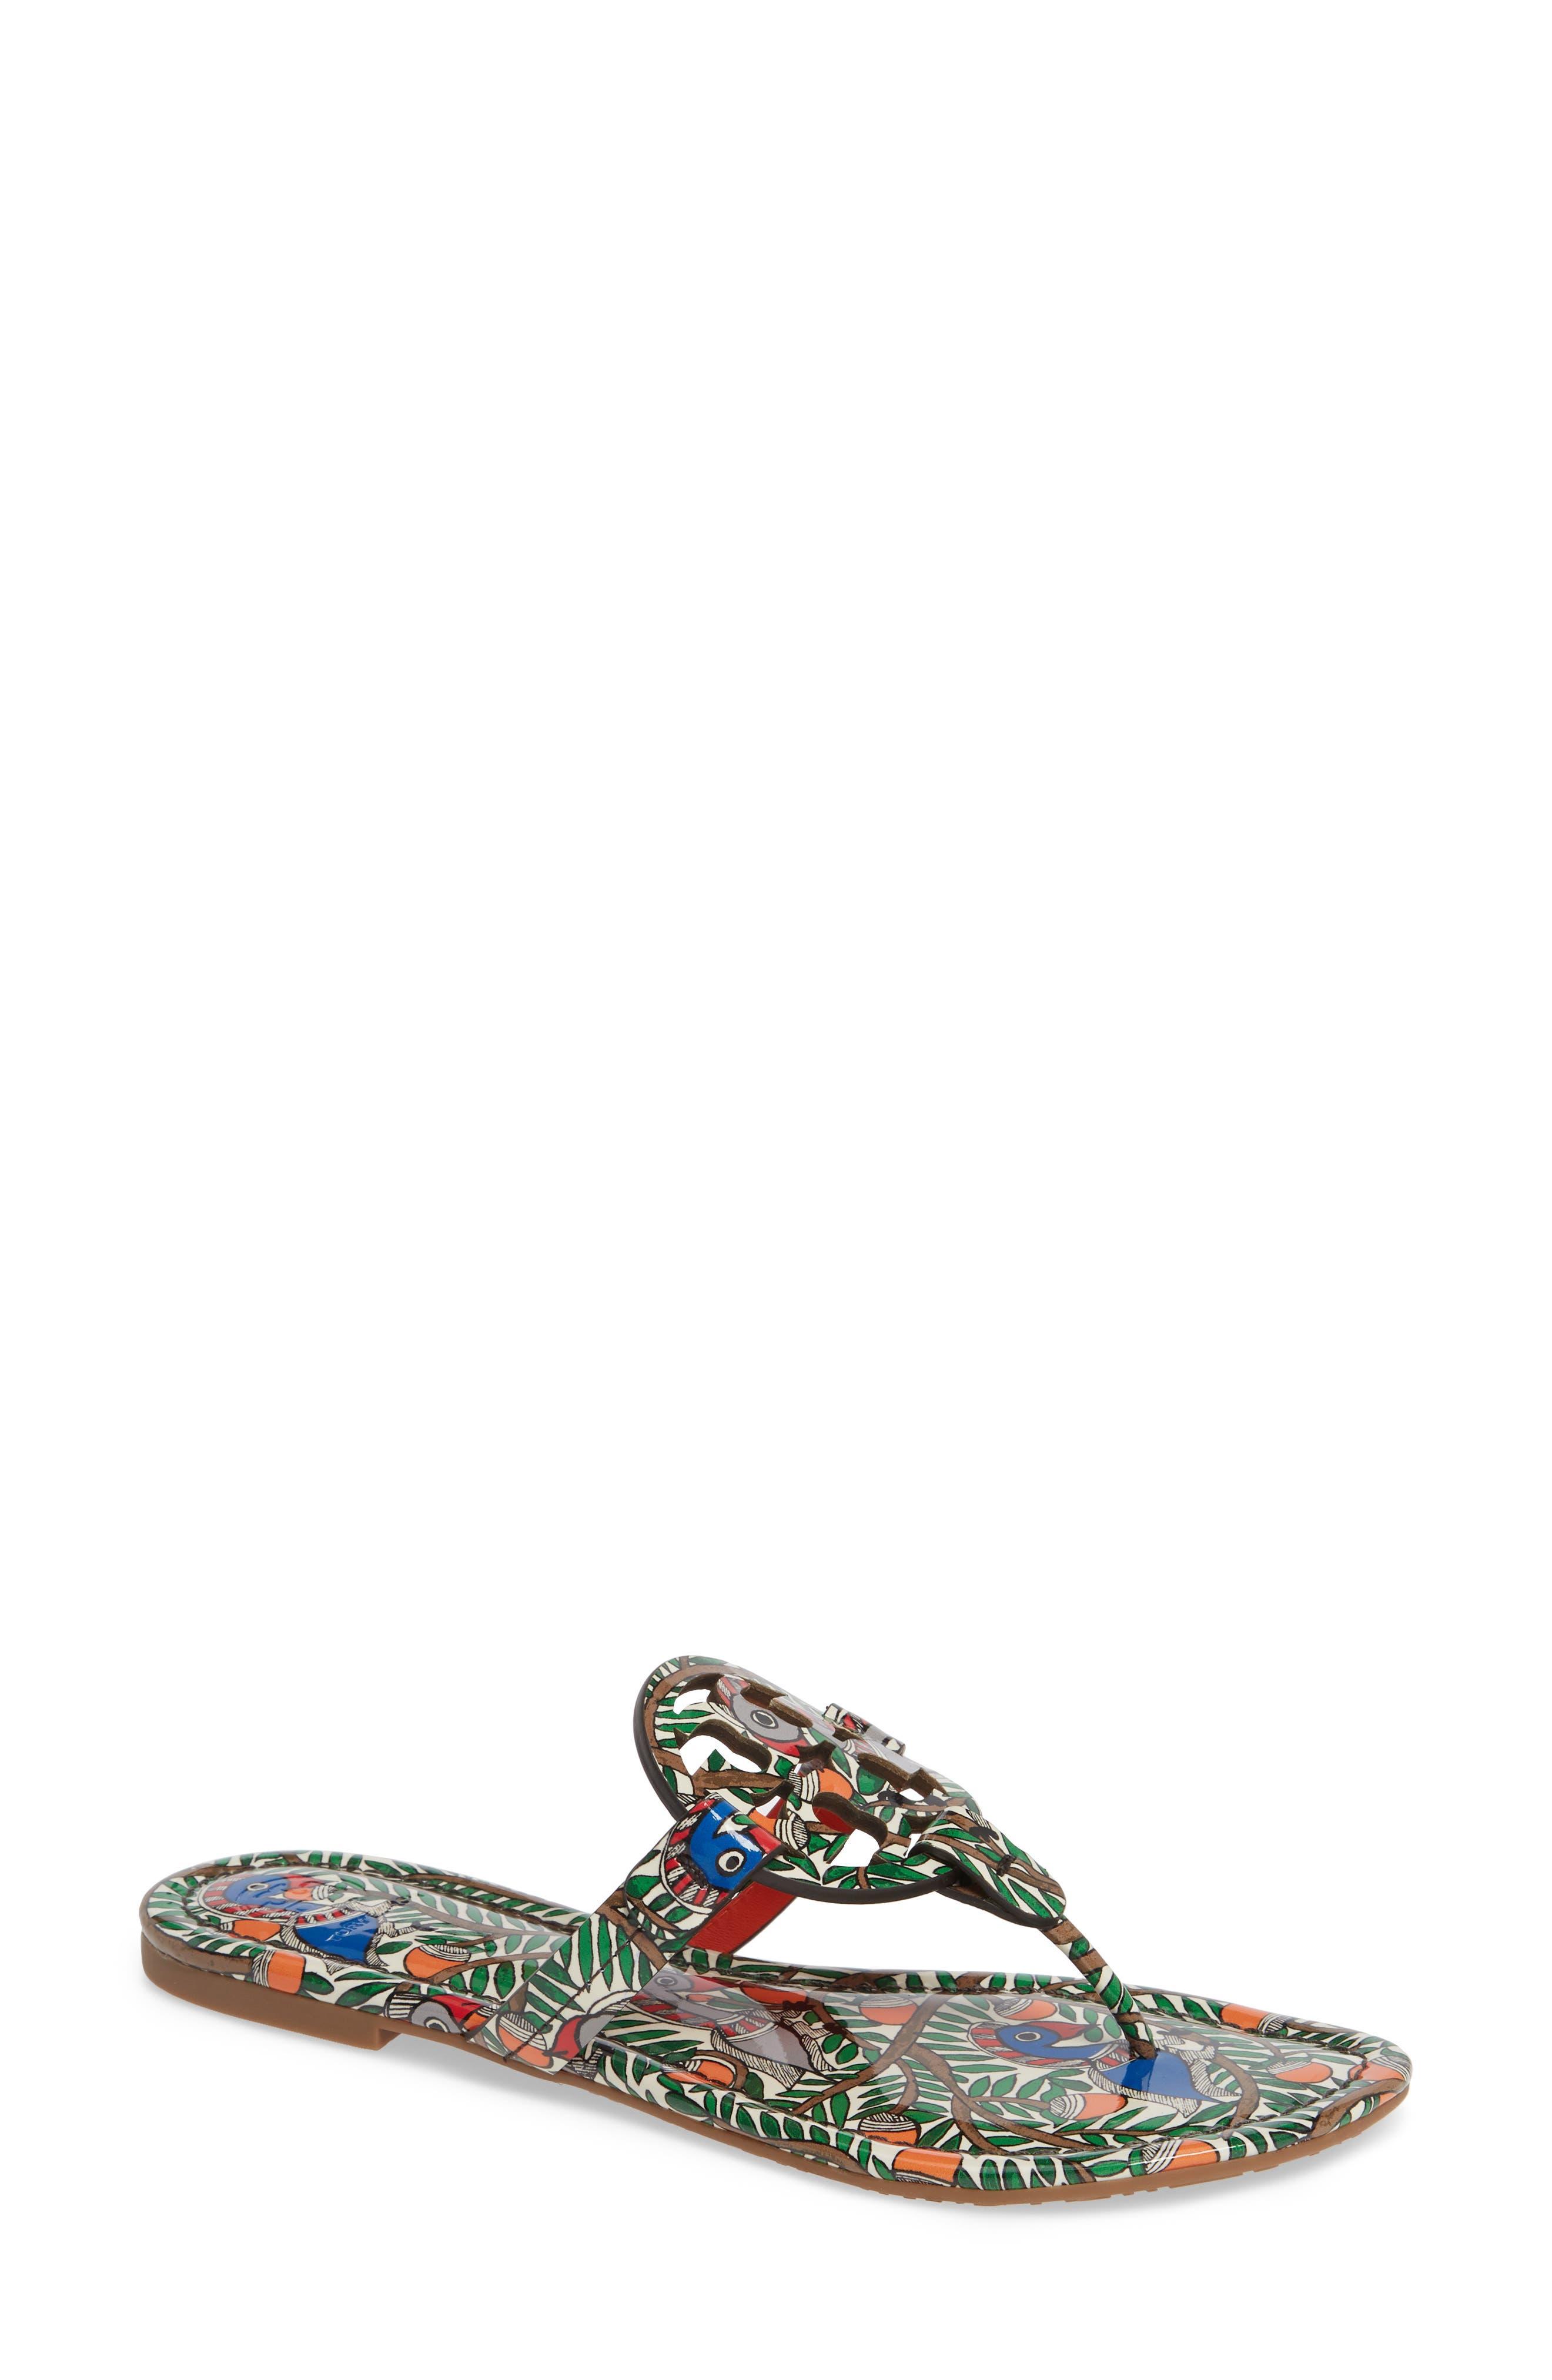 TORY BURCH Miller Flip Flop, Main, color, ORANGE SOMETHING WILD